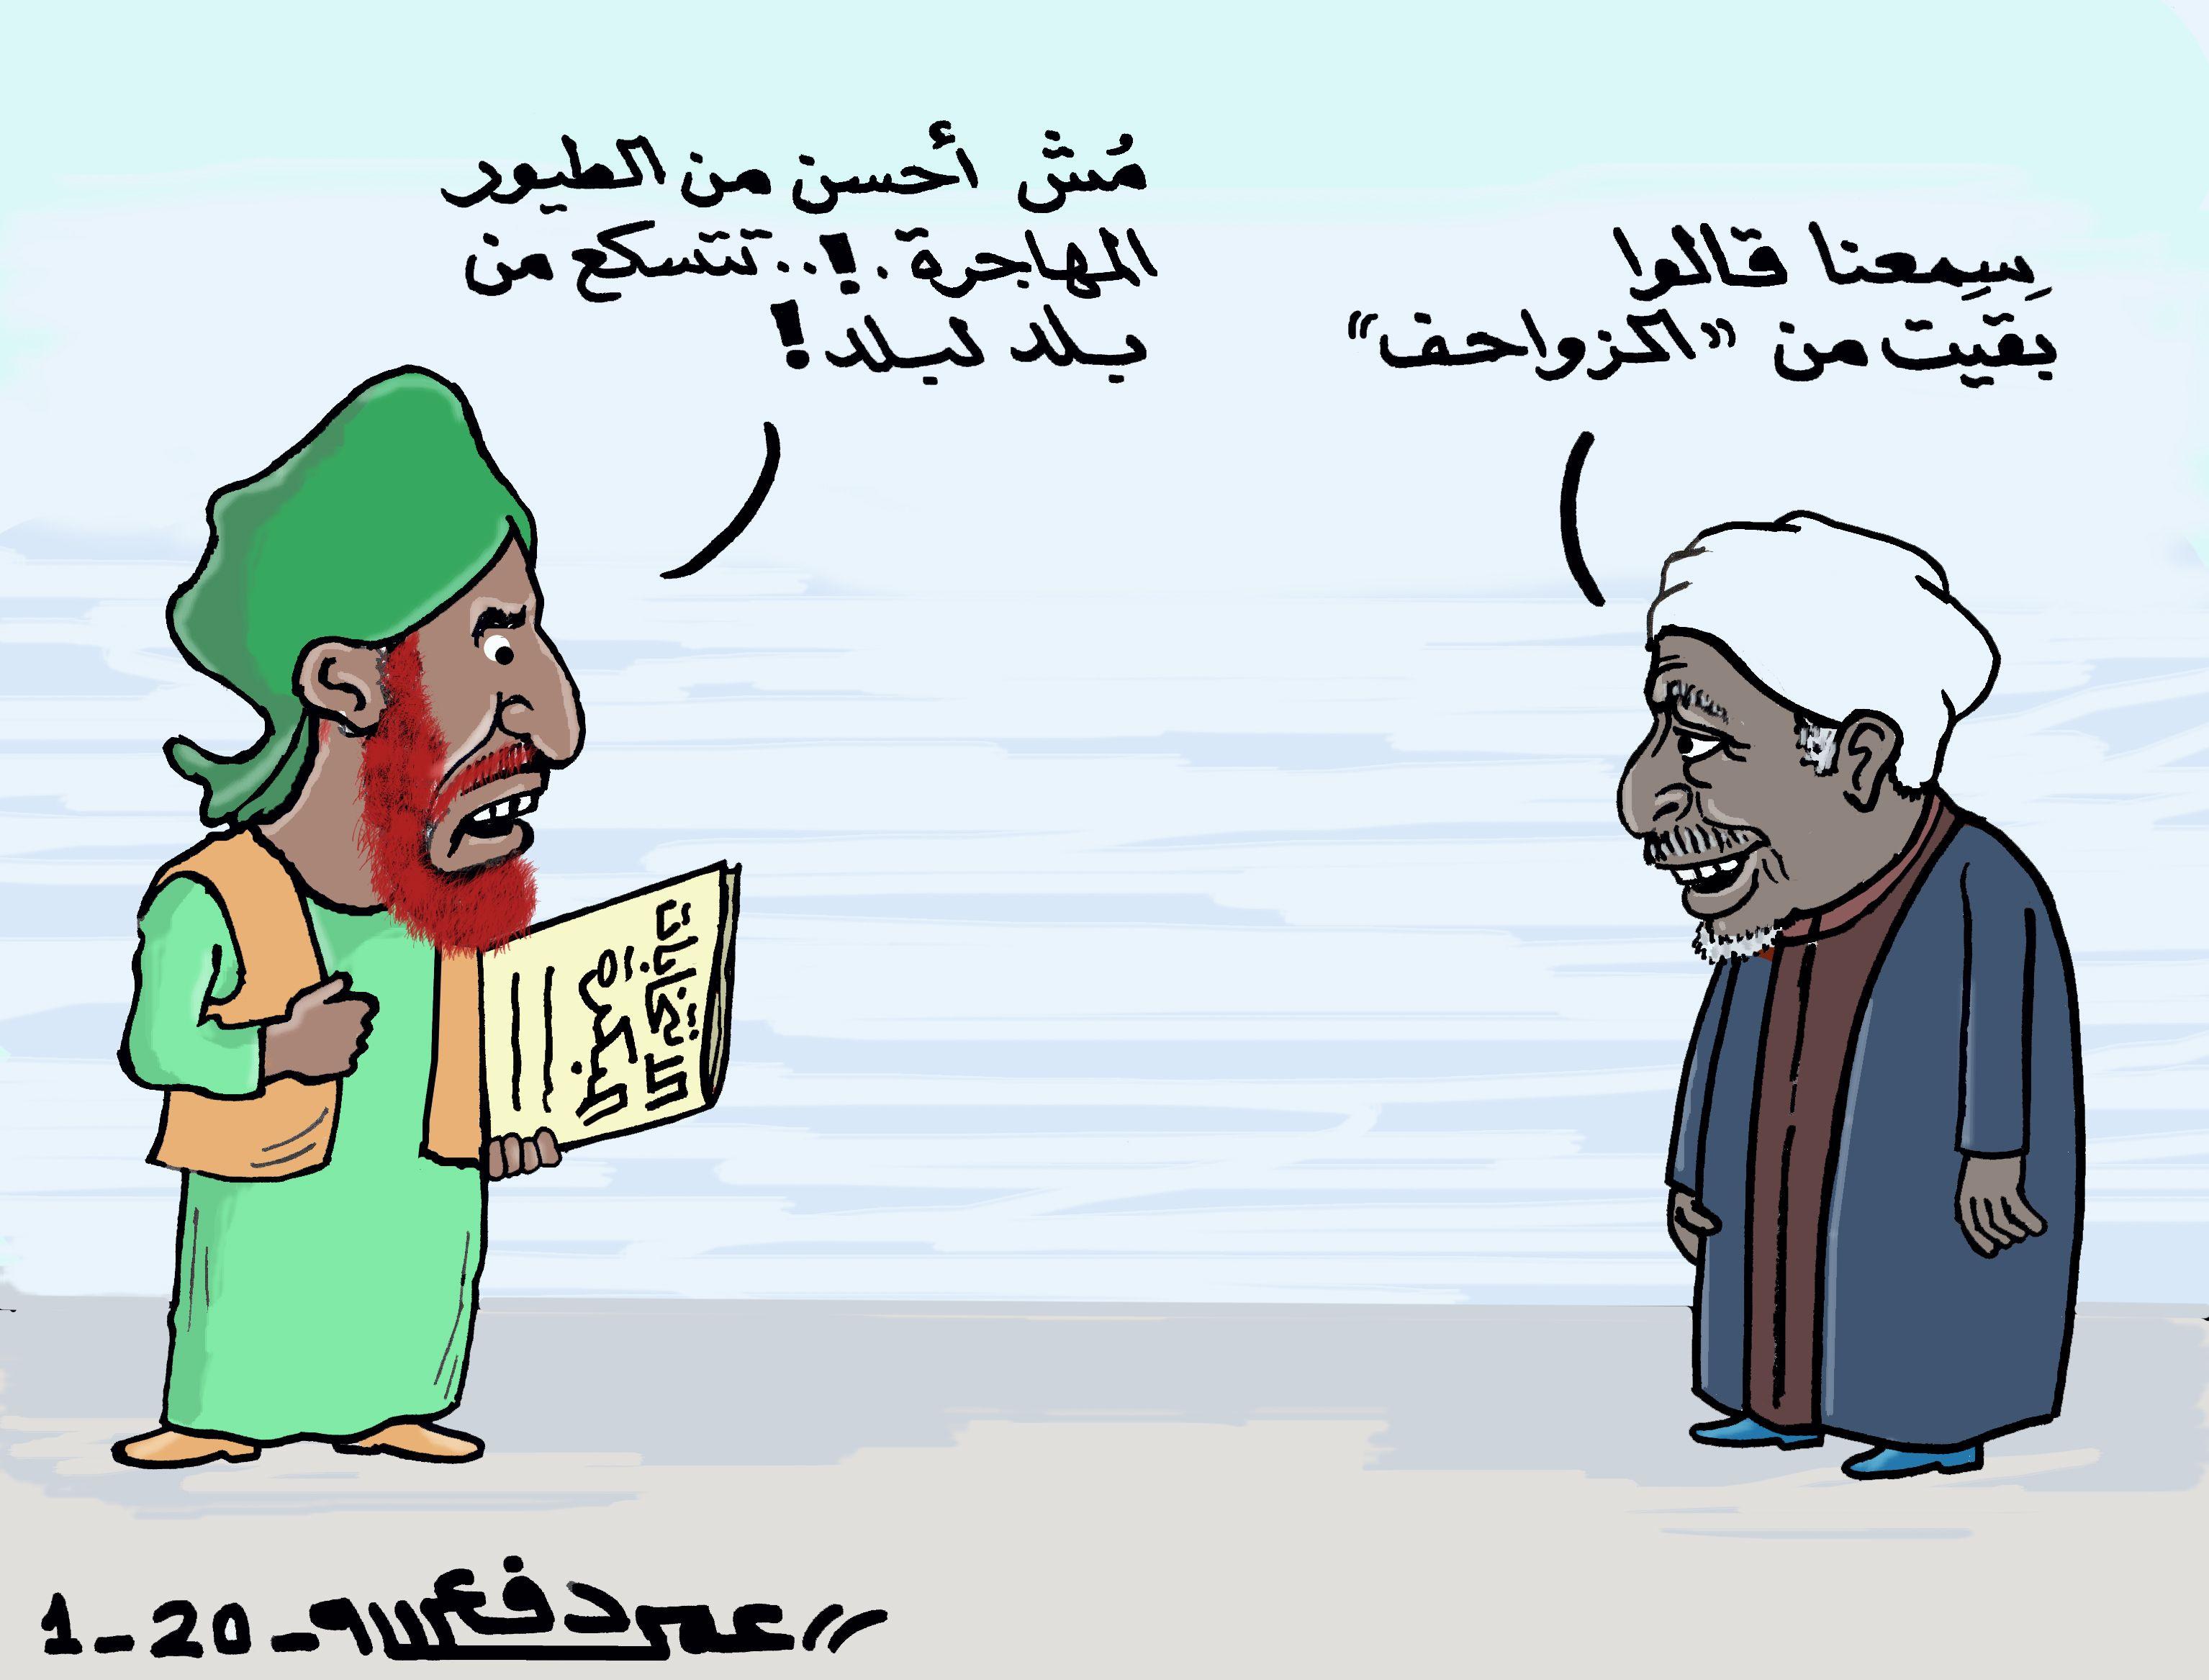 Pin by سودانيز اون لاين SudaneseOnlin on Sudan,Sudanese